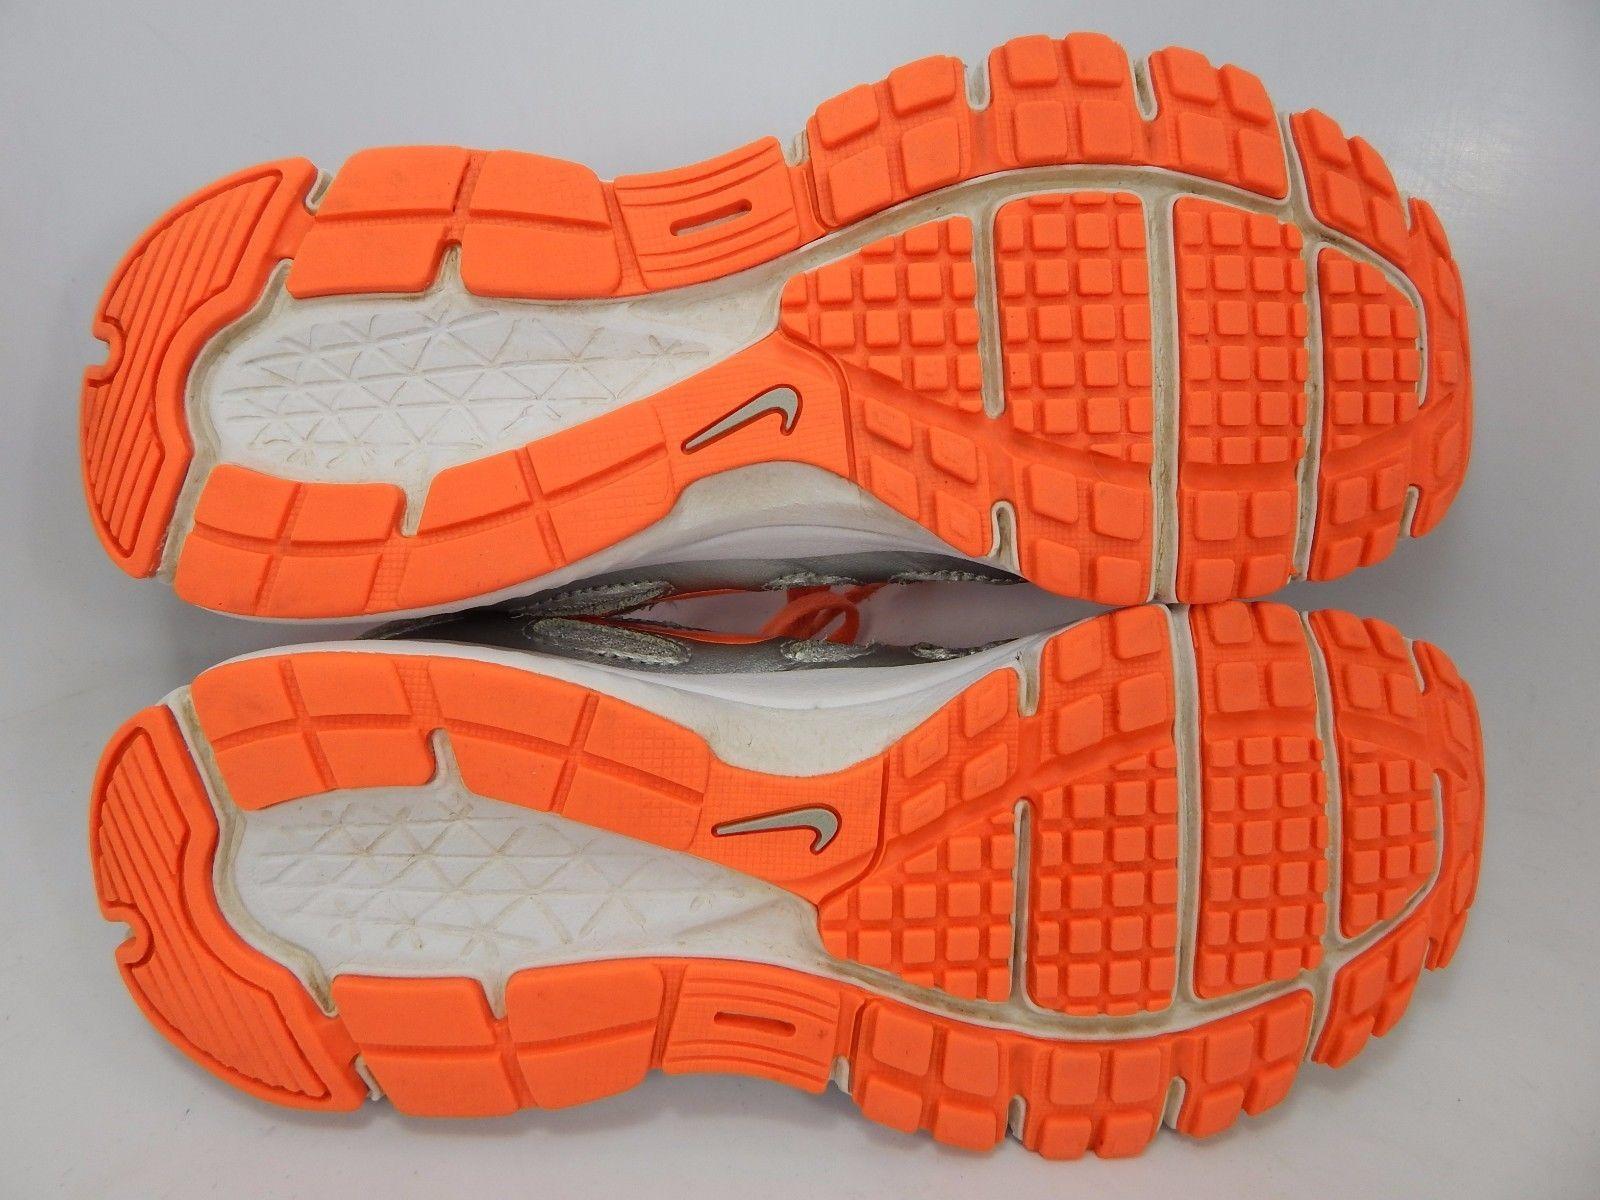 Nike Revolution 2 Women's Girls Running Shoes Size US 4.5 Y EU 36.5 555090-007